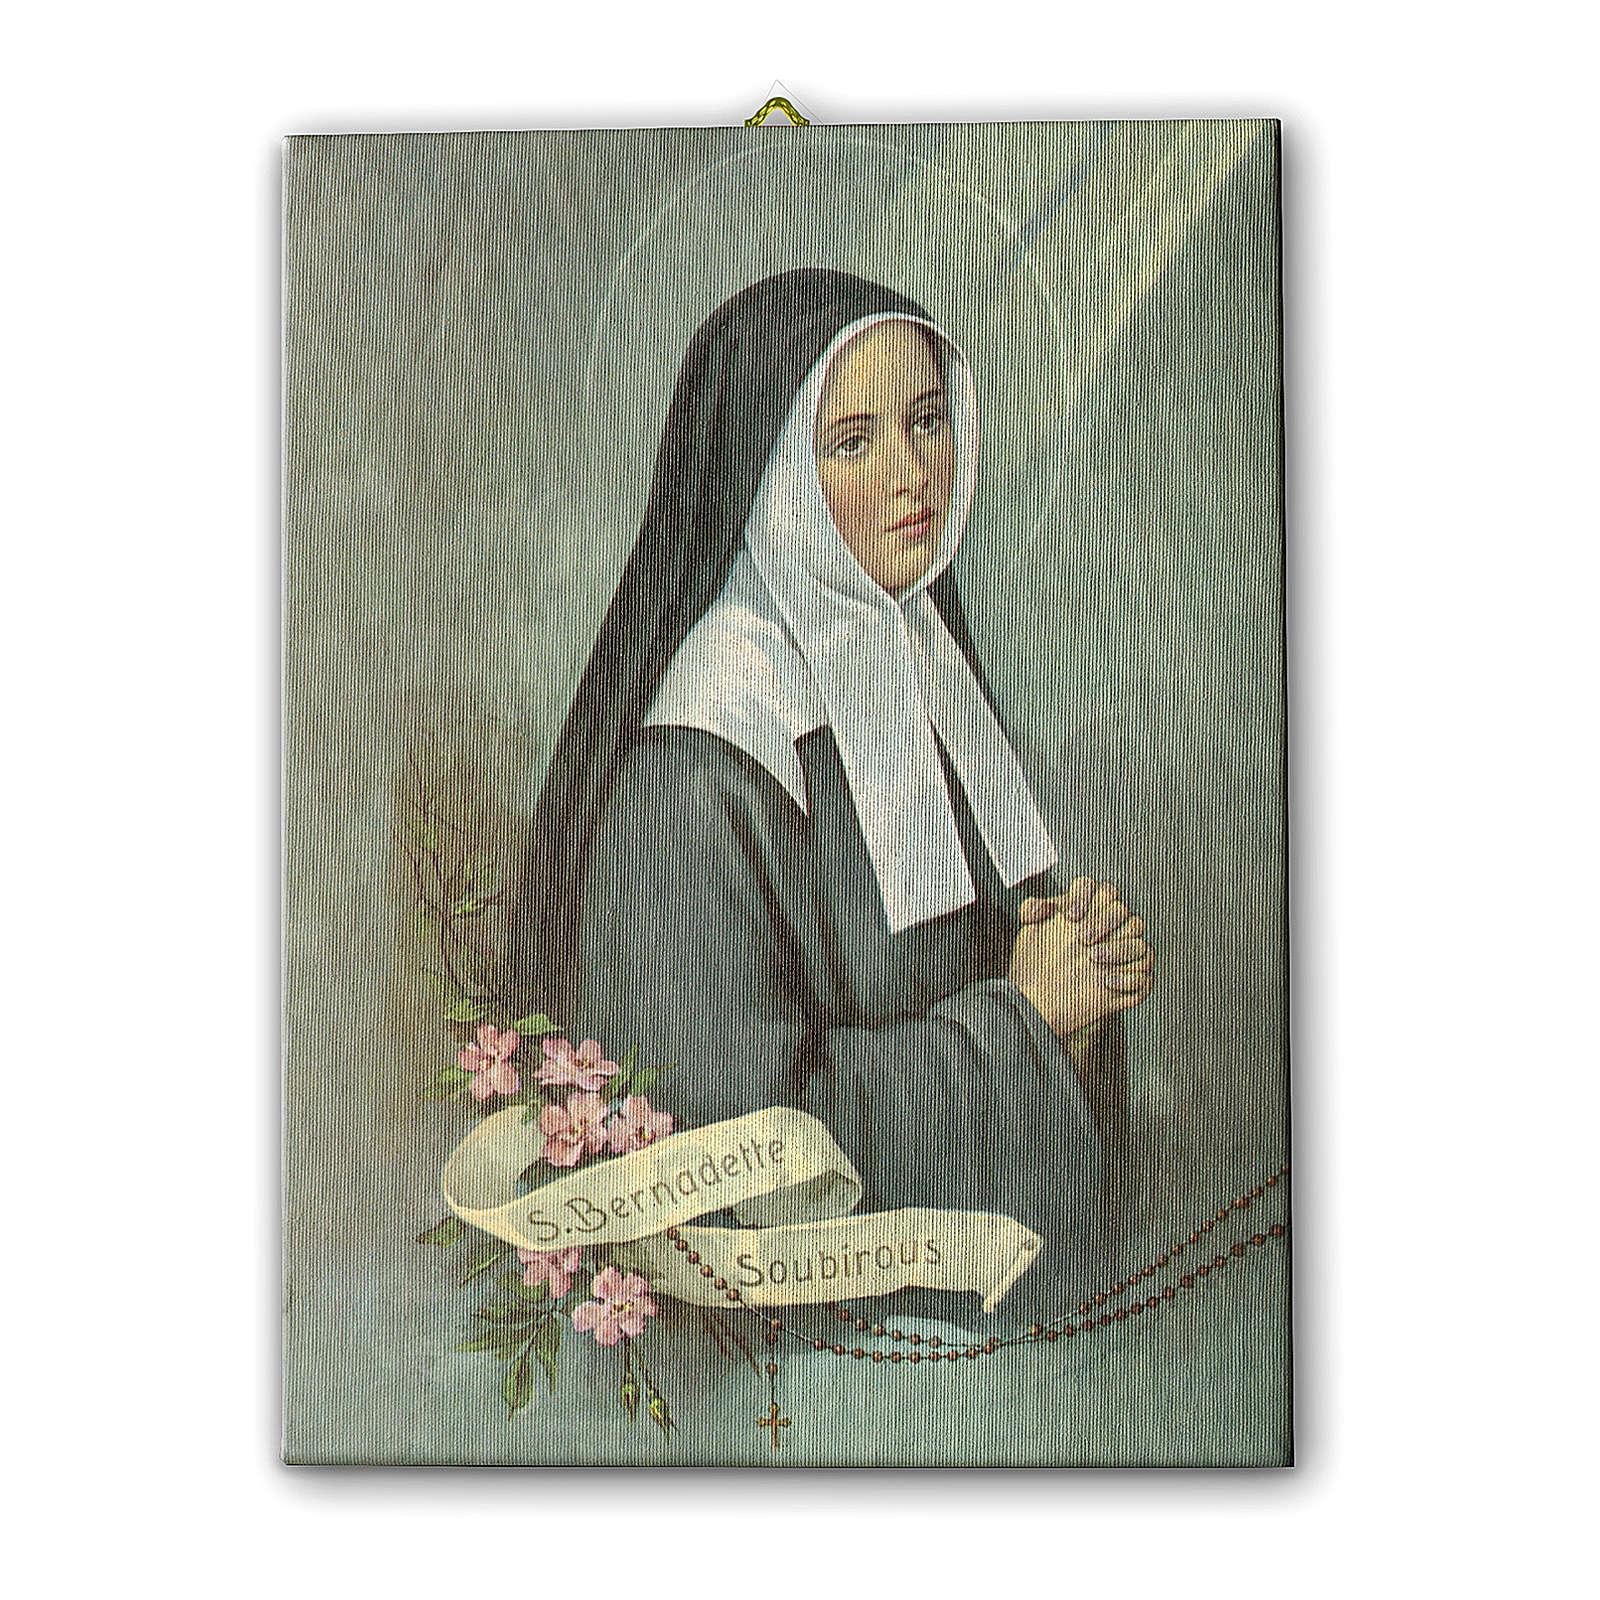 Quadro su tela pittorica Santa Bernadette 40x30 cm 3